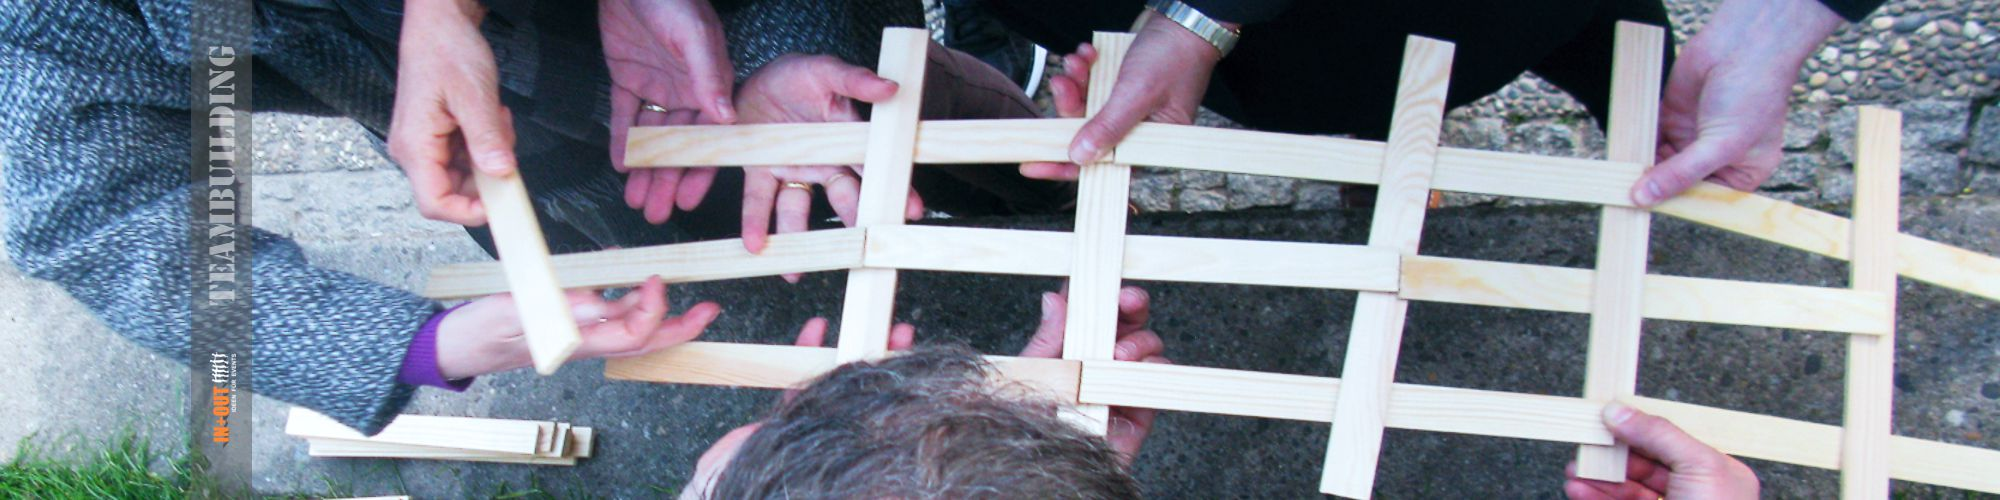 Teambuilding Modul Leonardo Brücke